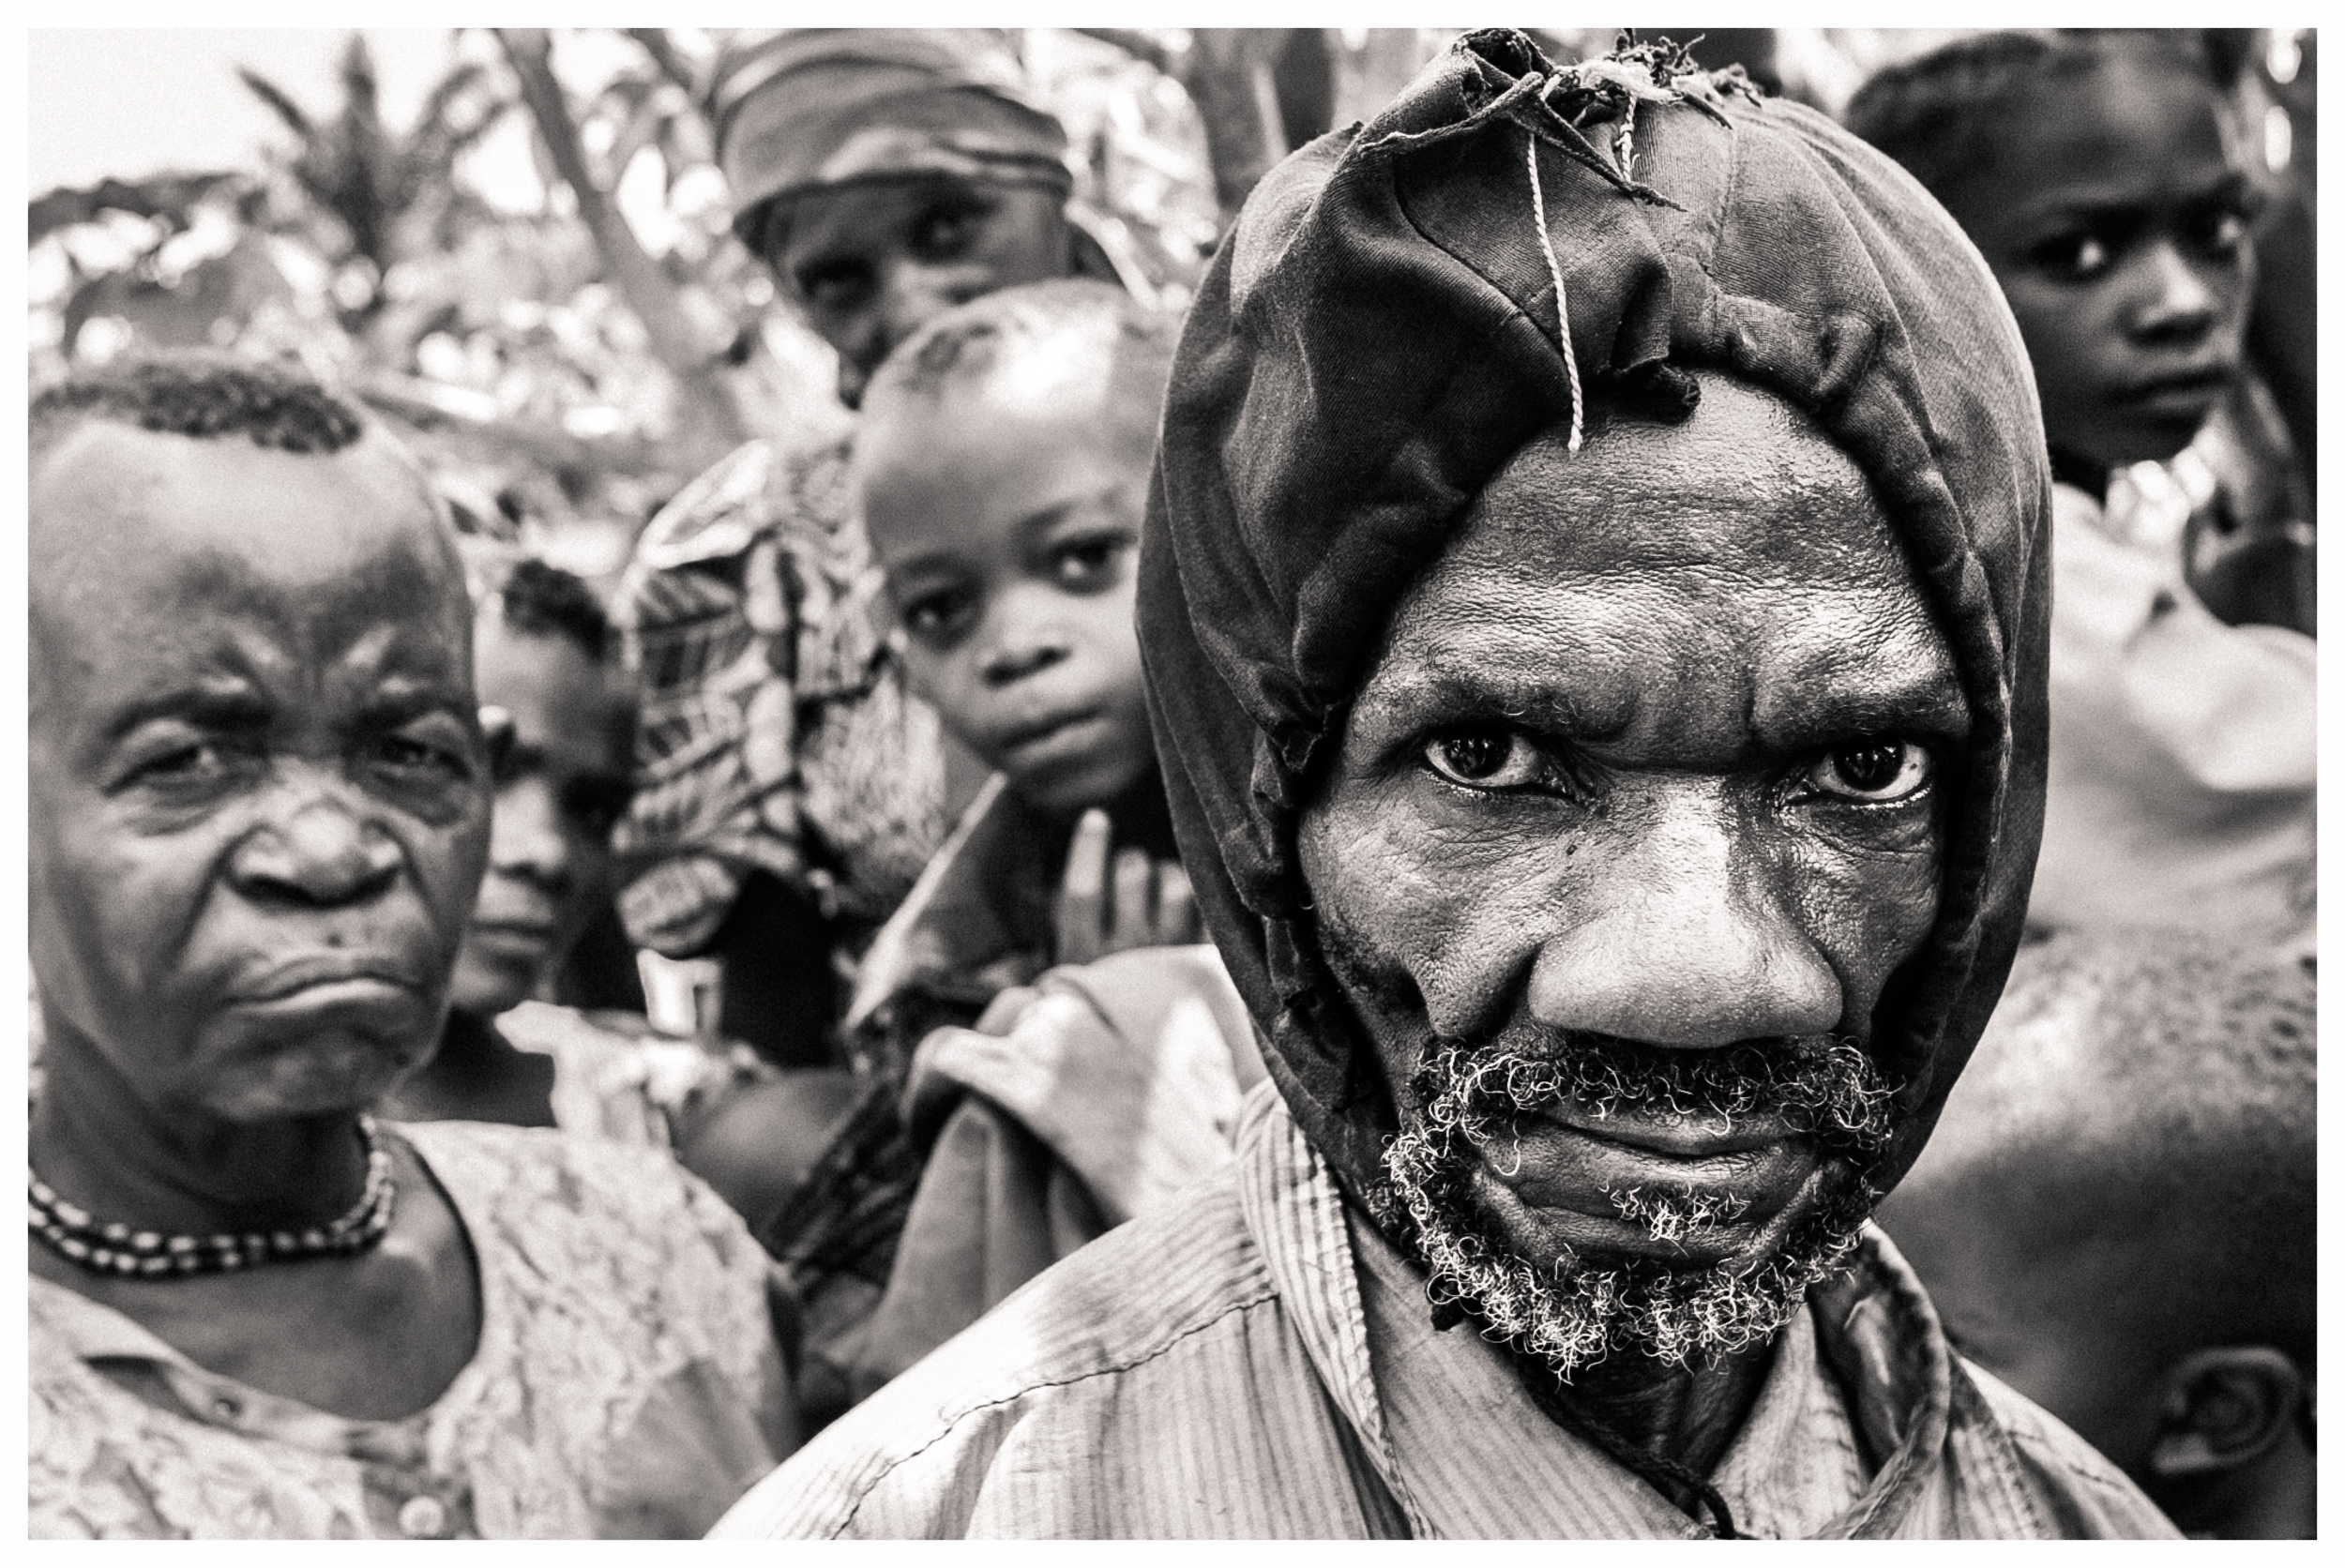 A pygmy elder in Eringeti, north east Congo. Photo © Marcus Perkins